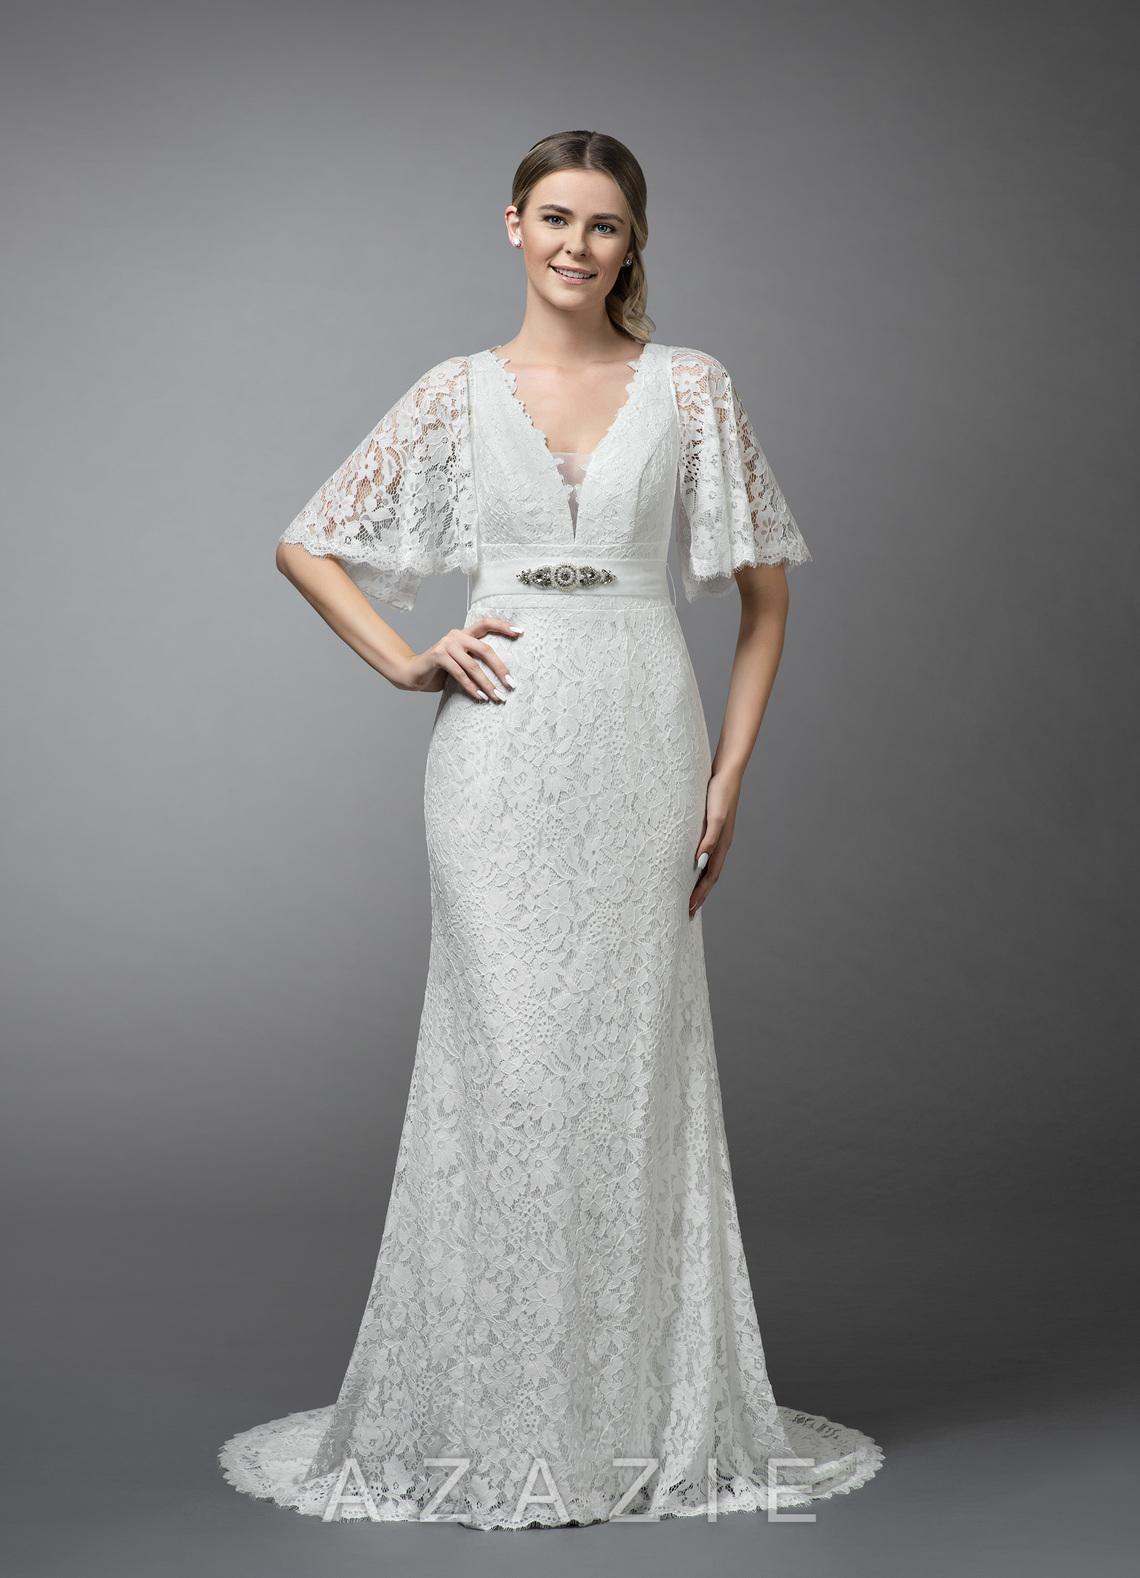 6ad3e0f1ca Azazie Cordelia BG Wedding Dress | Azazie